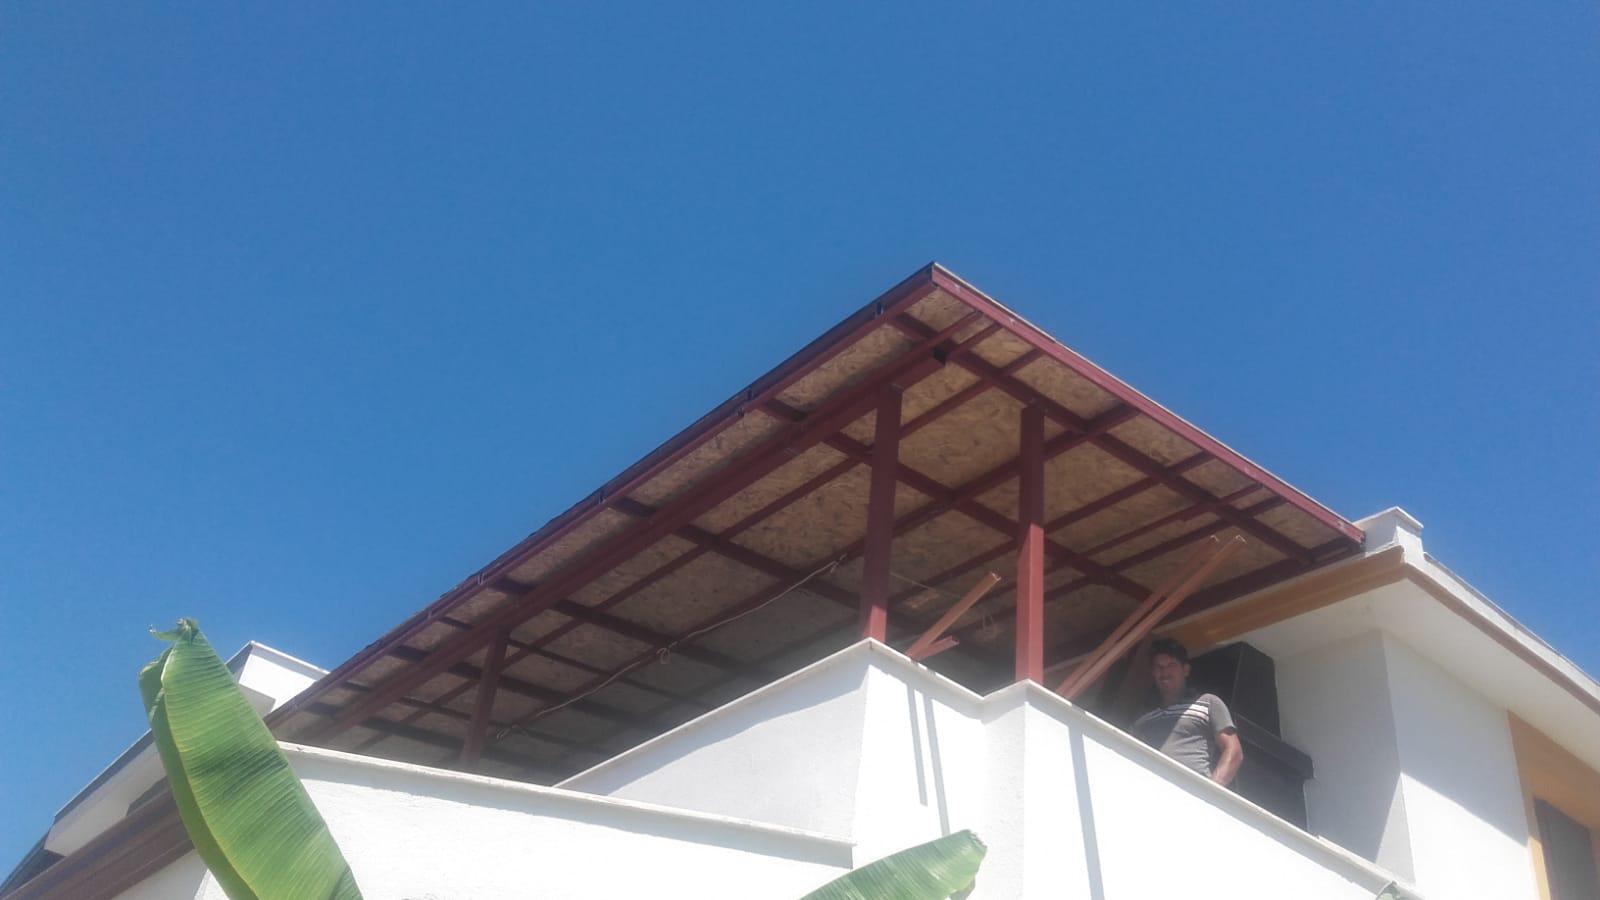 teras çatı yapımı izmir